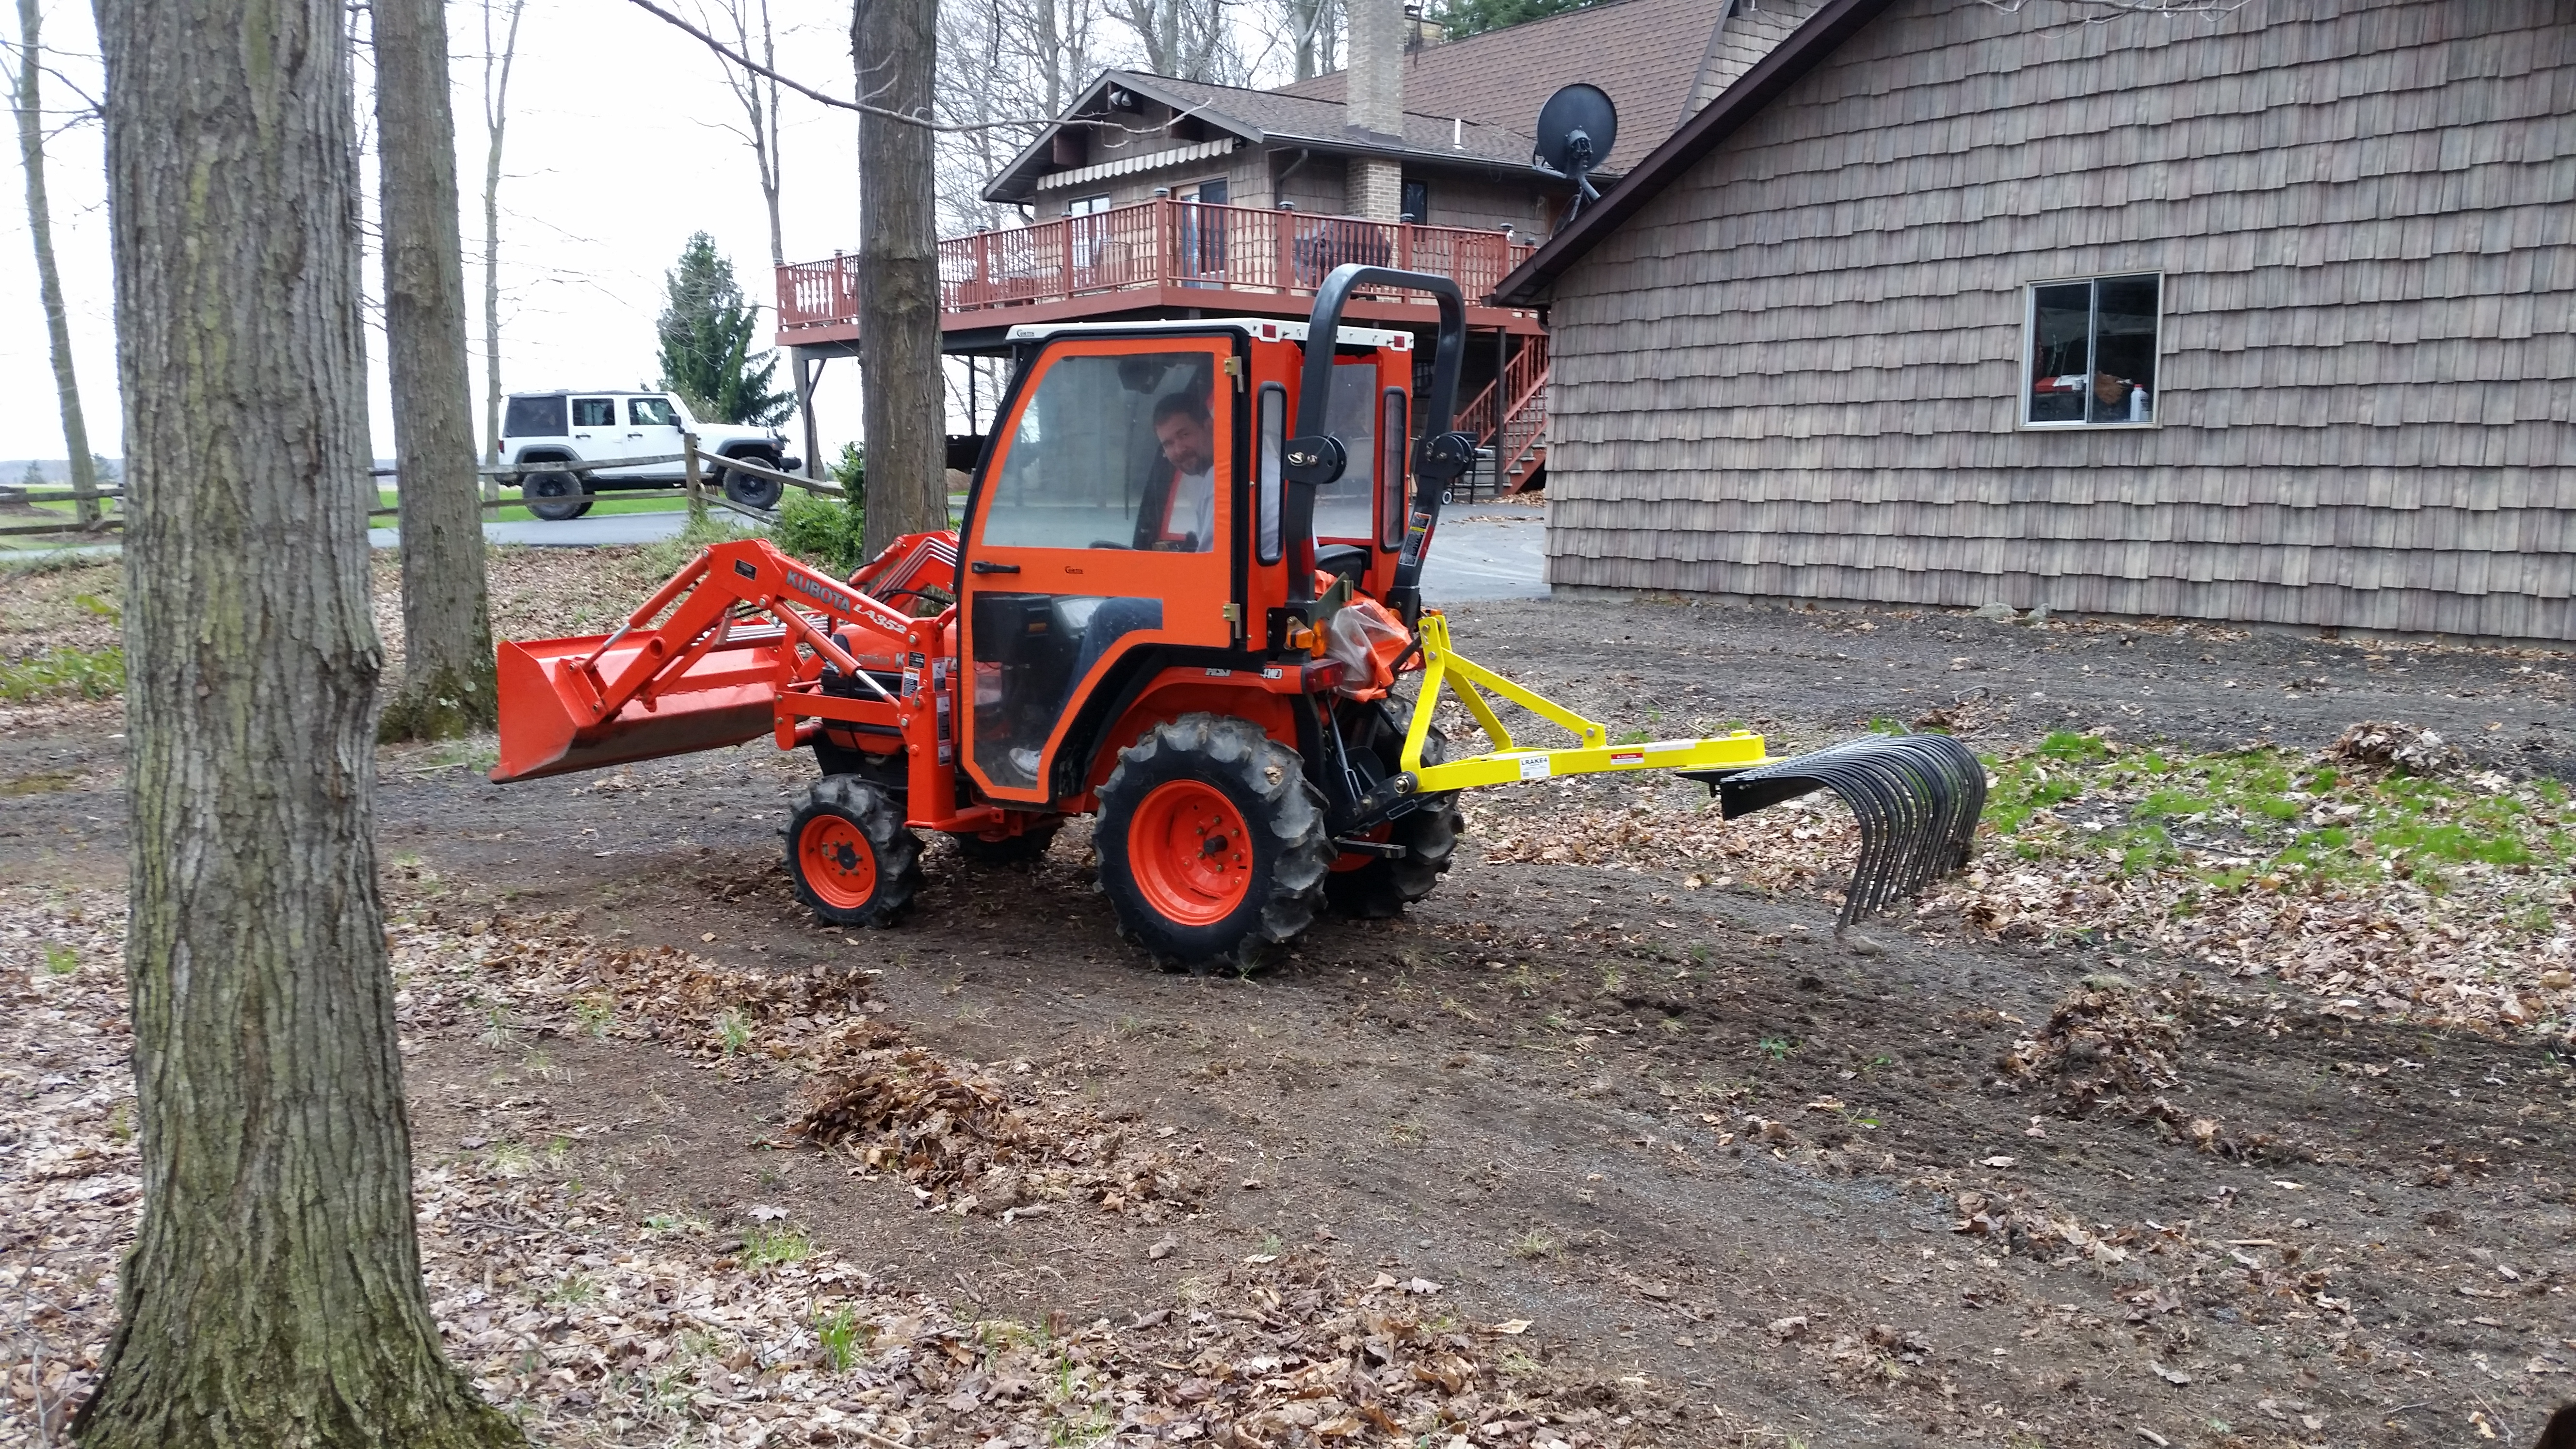 Two Point Tractor : Landscape york rock rake point soil gravel lawn tow